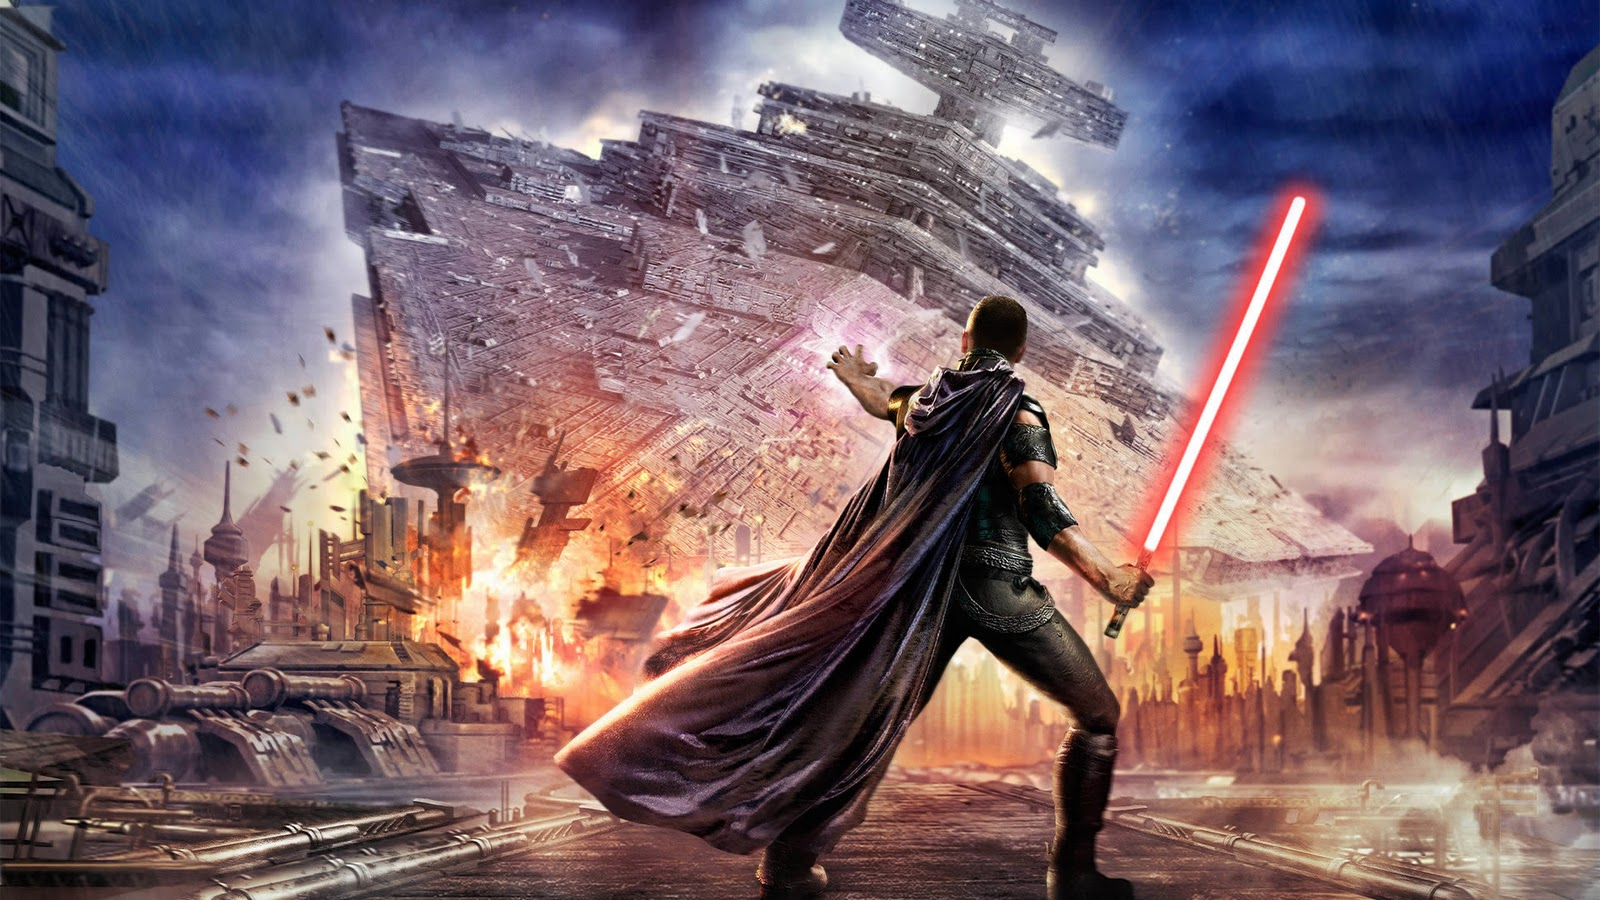 http://2.bp.blogspot.com/_H3VrOXpWbL4/TQa7D654FeI/AAAAAAAACmI/OjVEamBnAjo/s1600/force-unleashed3.jpg